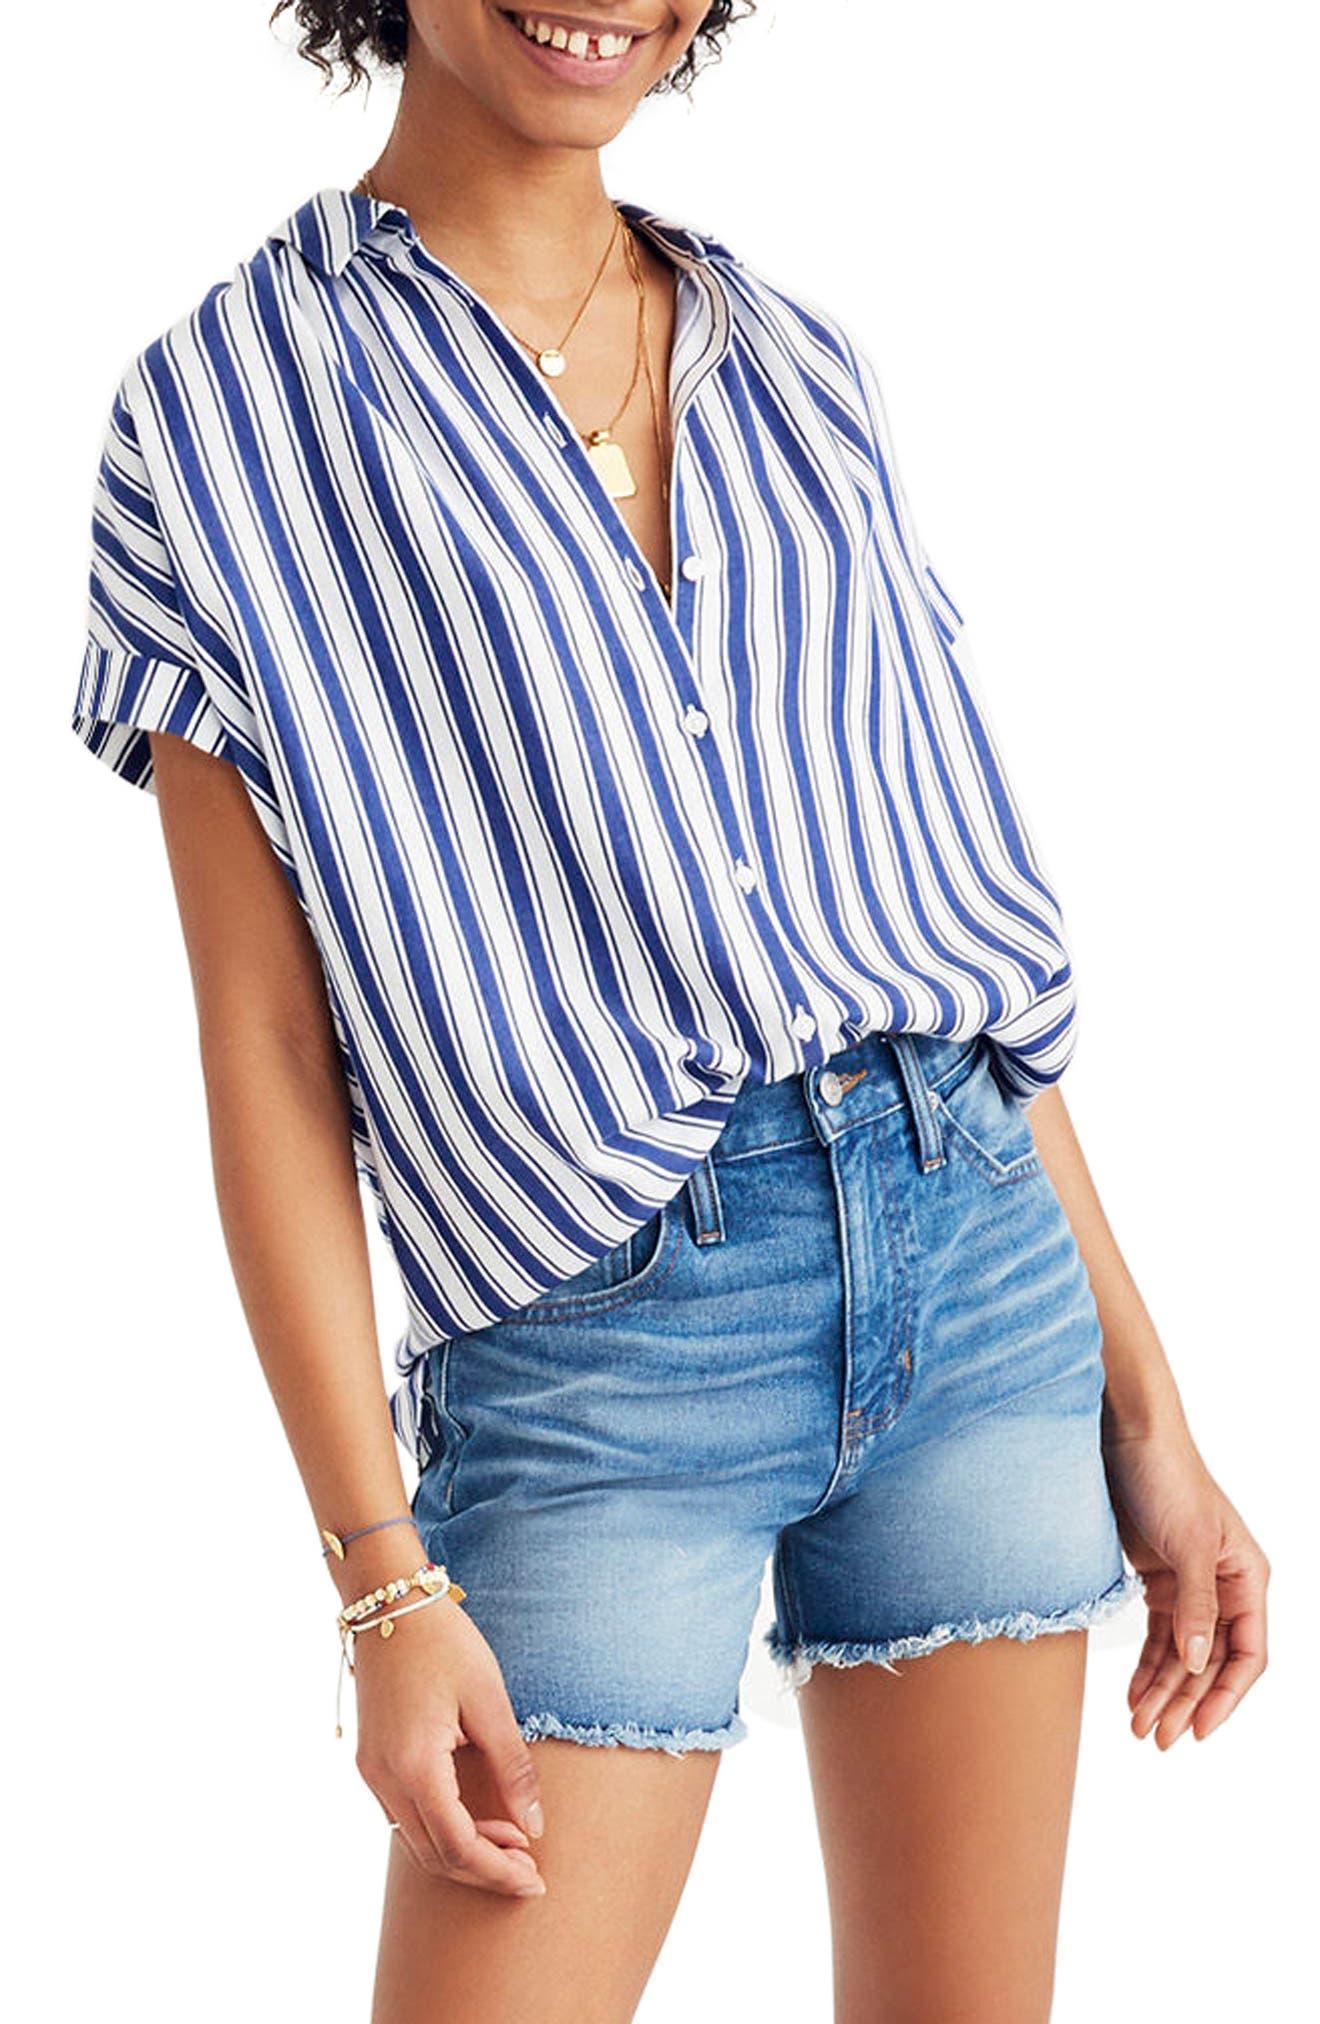 Stripe Central Shirt,                             Main thumbnail 1, color,                             400